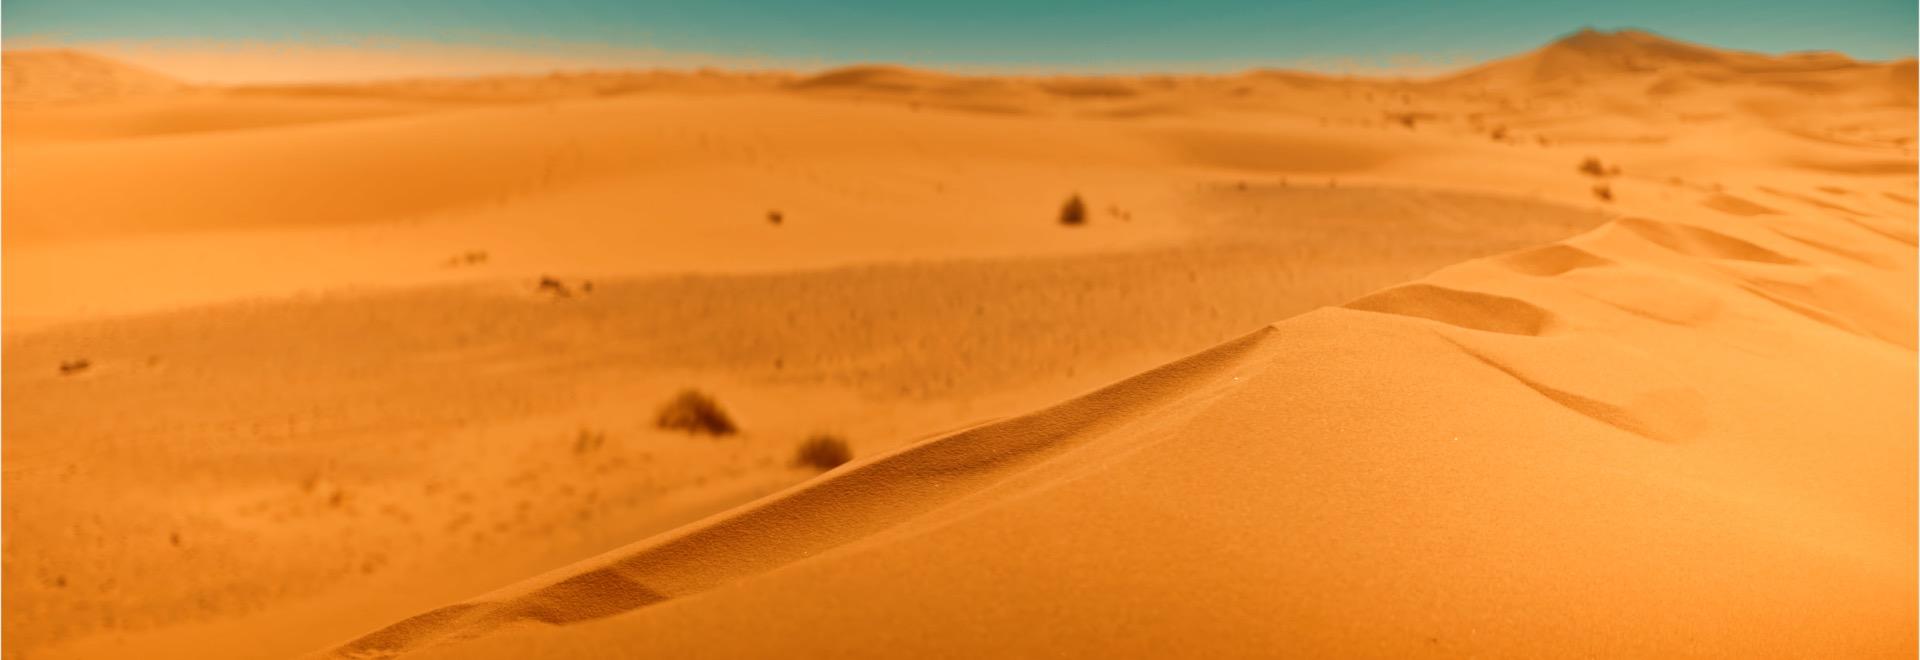 close dunes.jpg